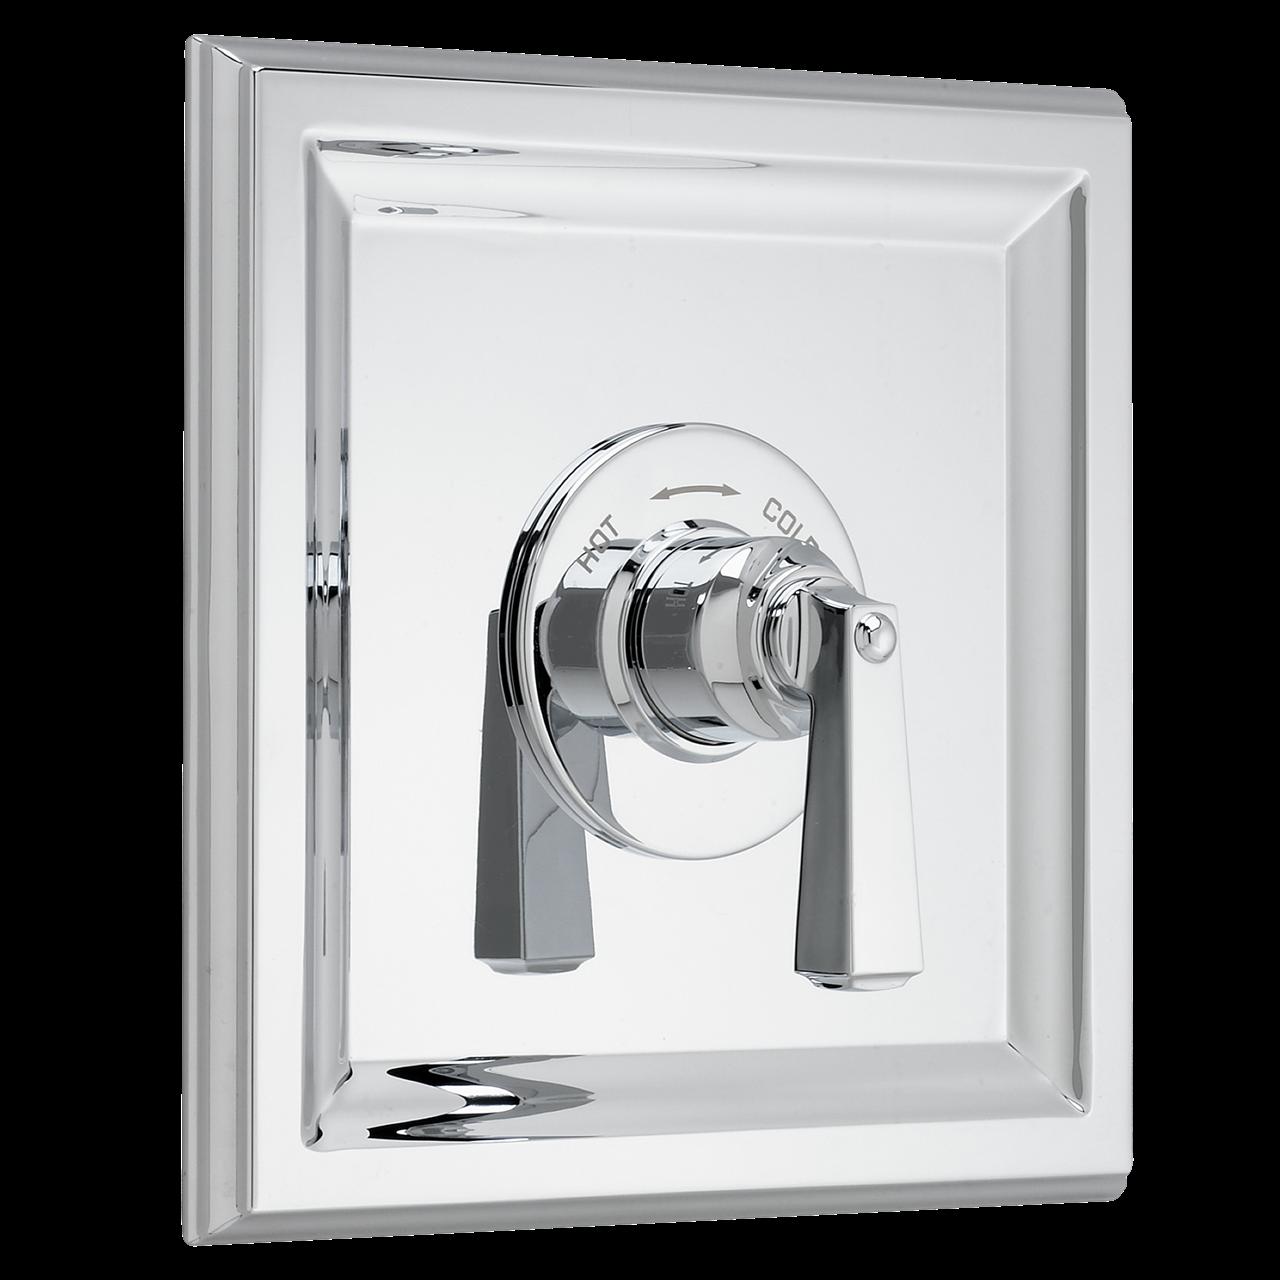 153 Shower Faucets Town Square Central Thermostatic Valve Trim Kit Polished Chrome Shower Faucet Shower Faucets Faucet